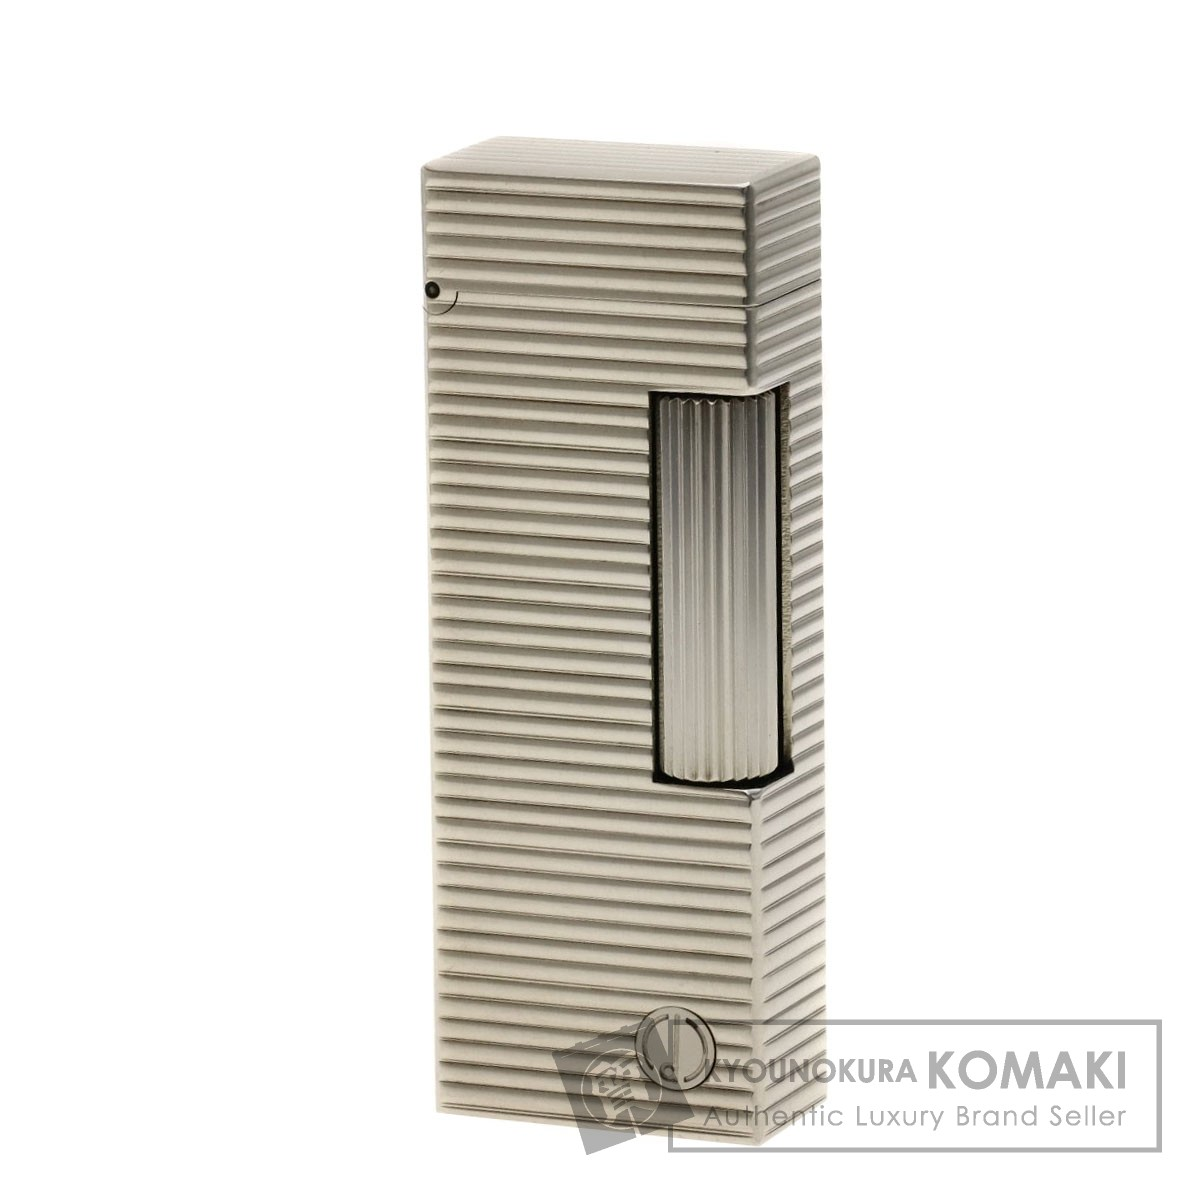 Dunhill ローラガス ライター 金属製 メンズ 【中古】【ダンヒル】